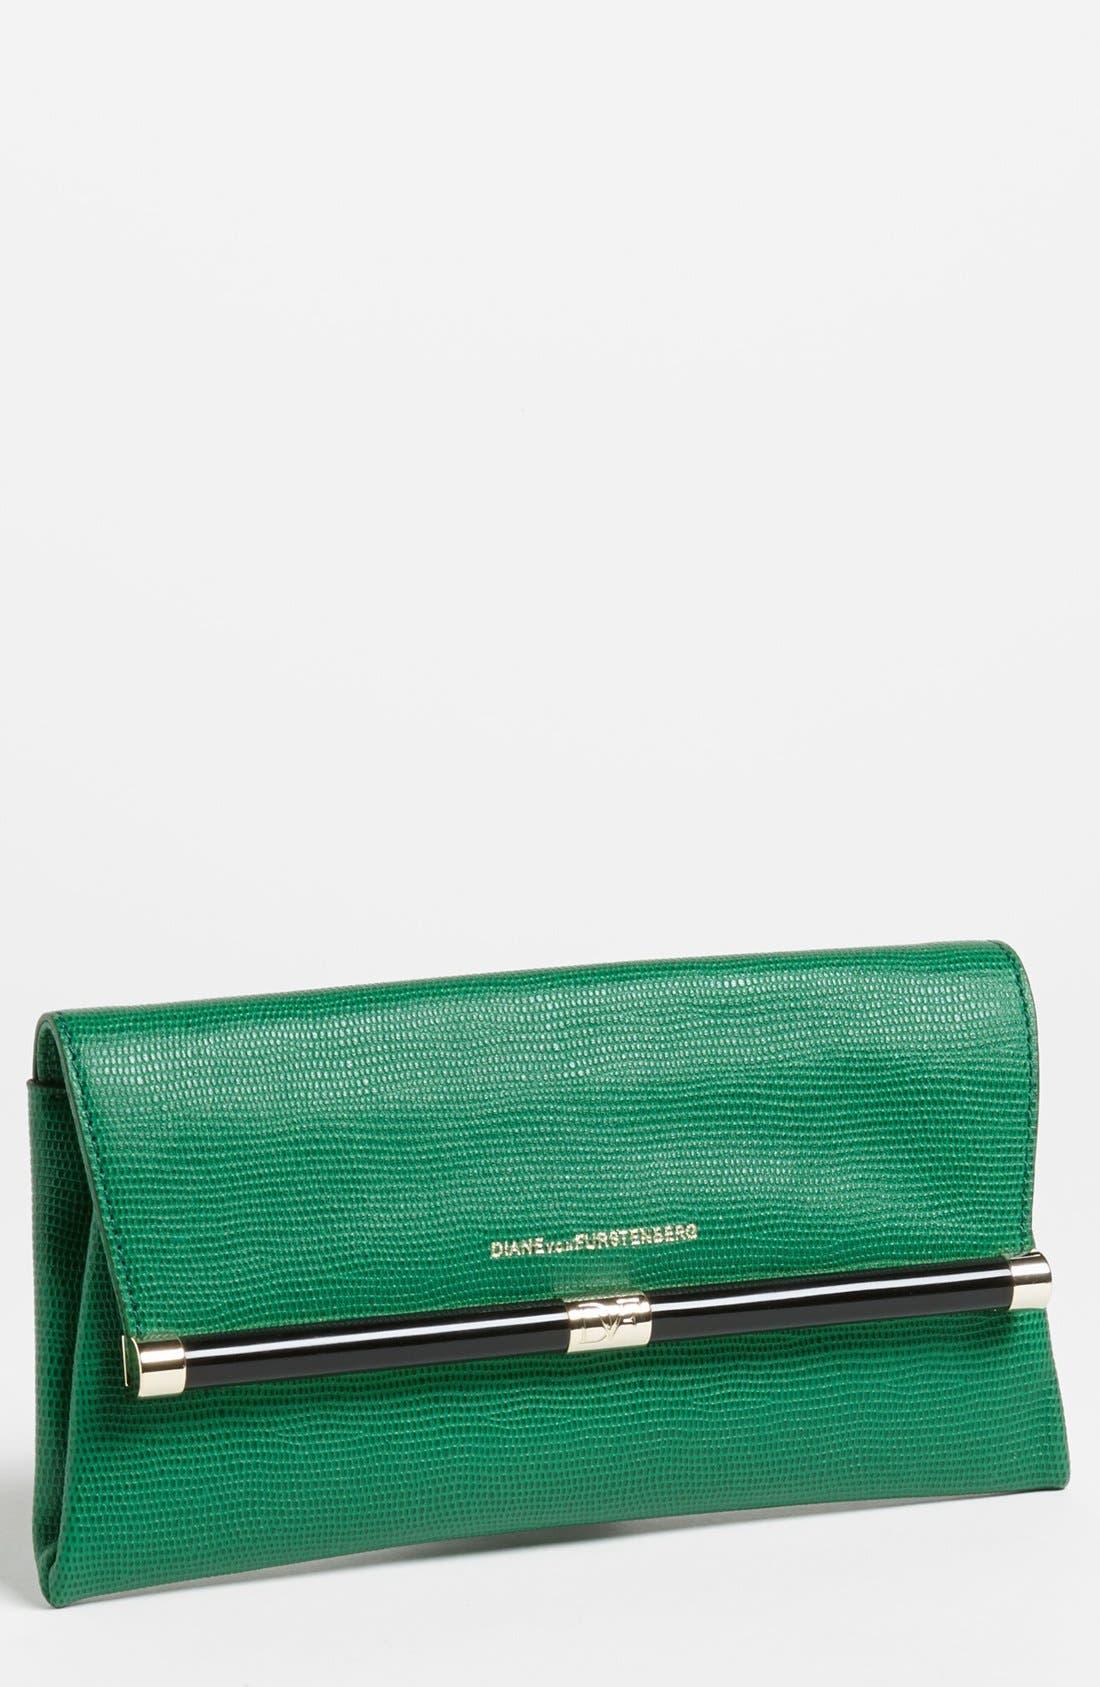 Alternate Image 1 Selected - Diane von Furstenberg '440 - Envelope' Lizard Embossed Leather Clutch